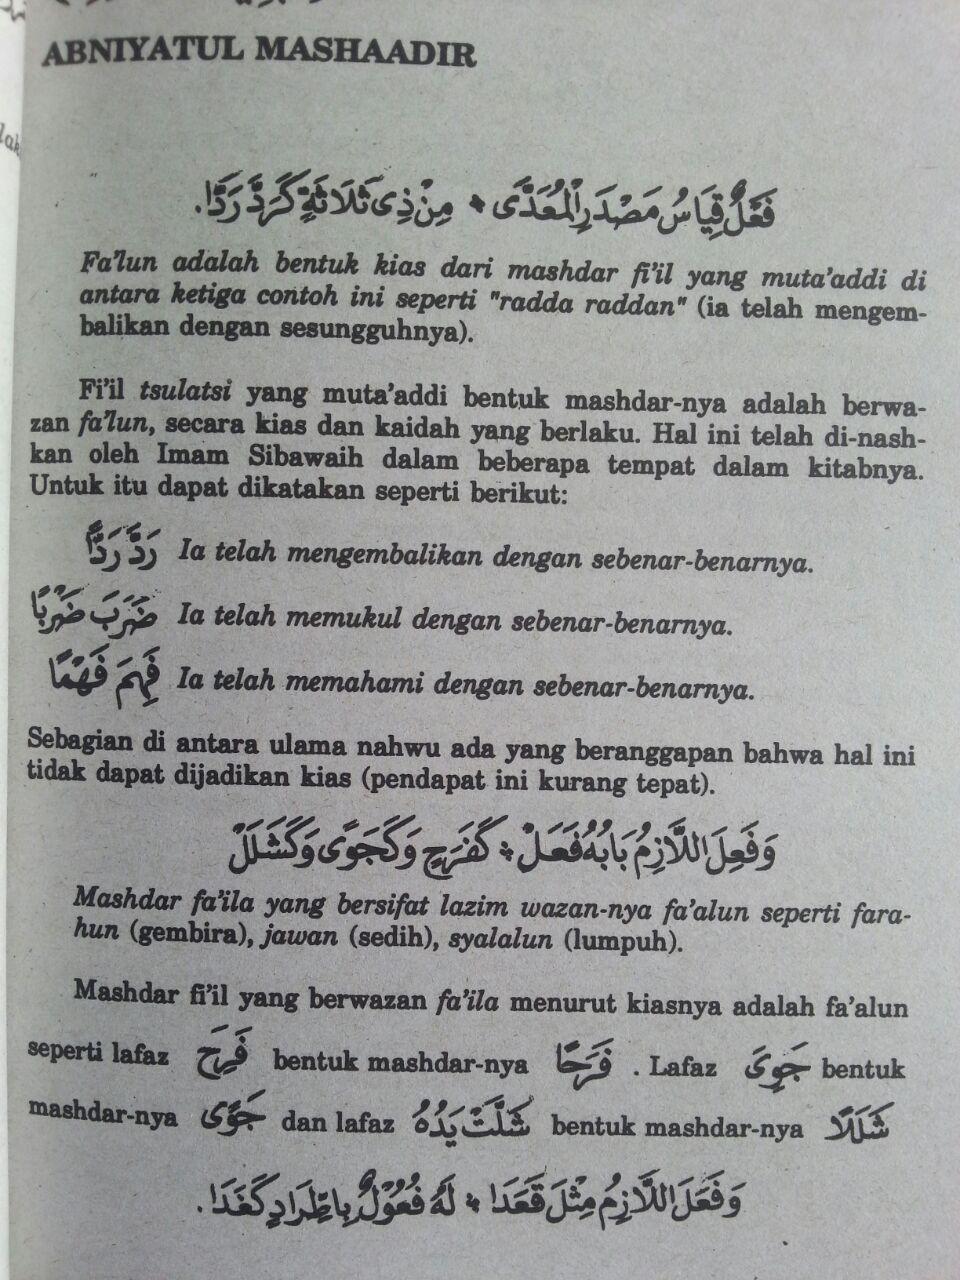 Buku Terjemahan Alfiyyah Syarah Ibnu Aqil Soft Cover Set 2 Jilid isi